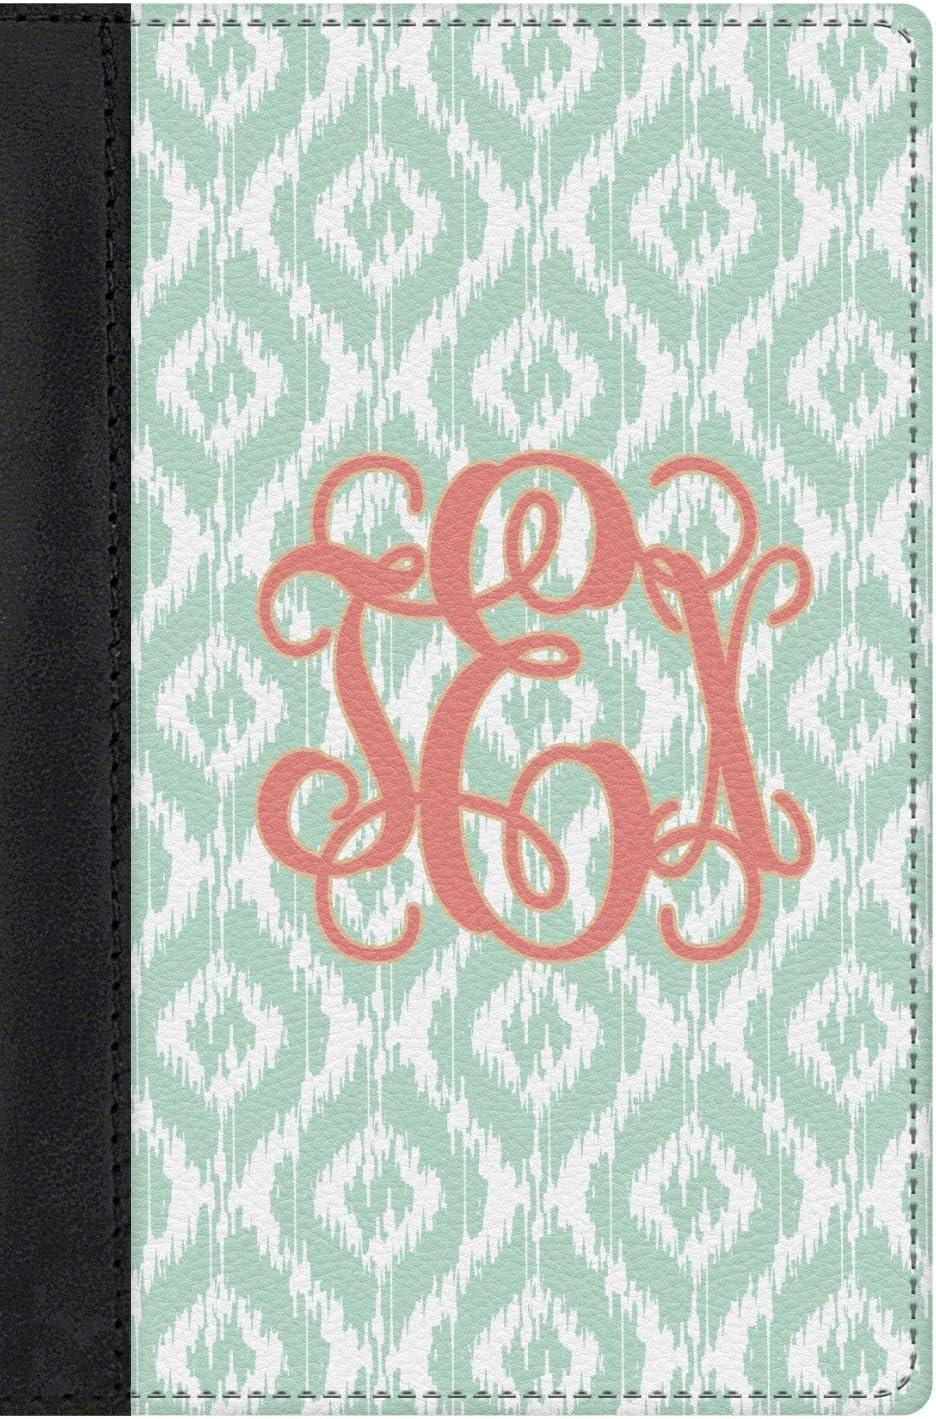 Personalized Monogram Genuine Leather Passport Cover